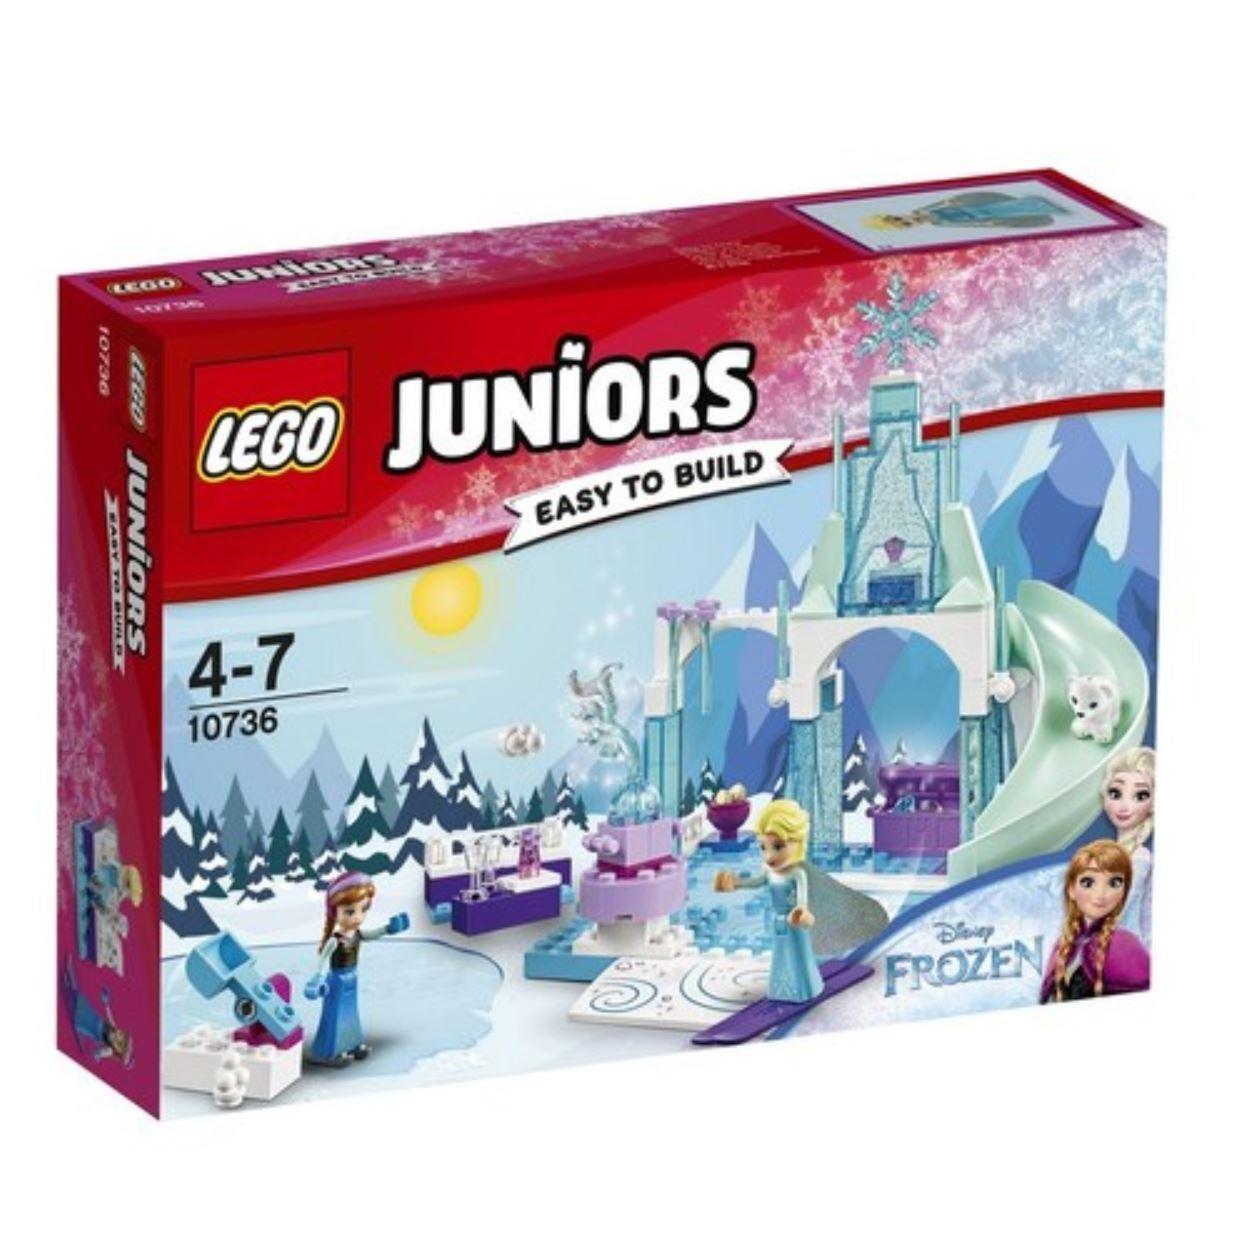 [LEGO]  JUNIORS Anna & Elsa's Frozen Playground 10736 2017 Version Free Shipping